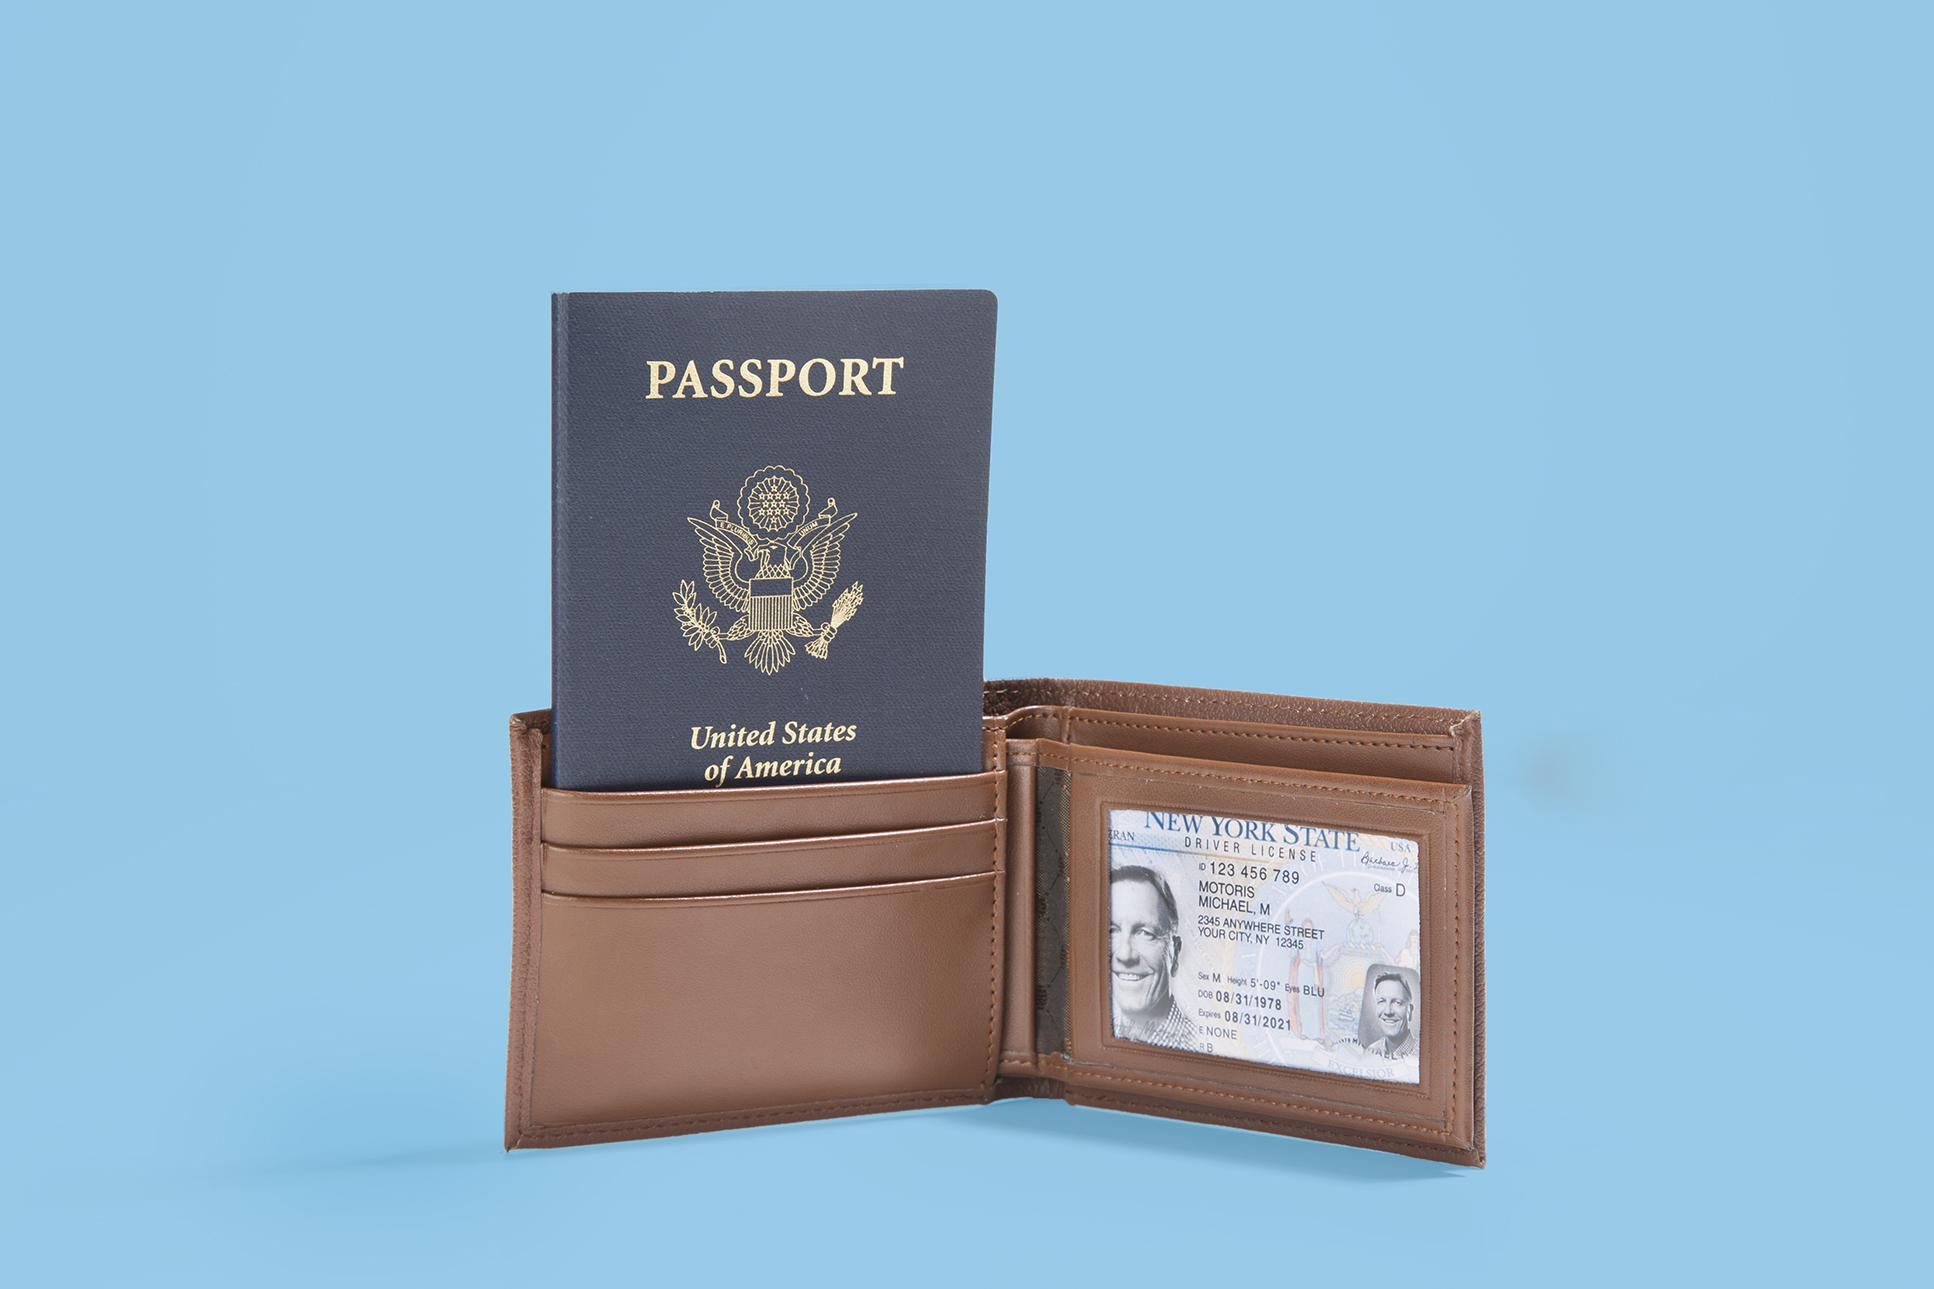 Walllet with Passport